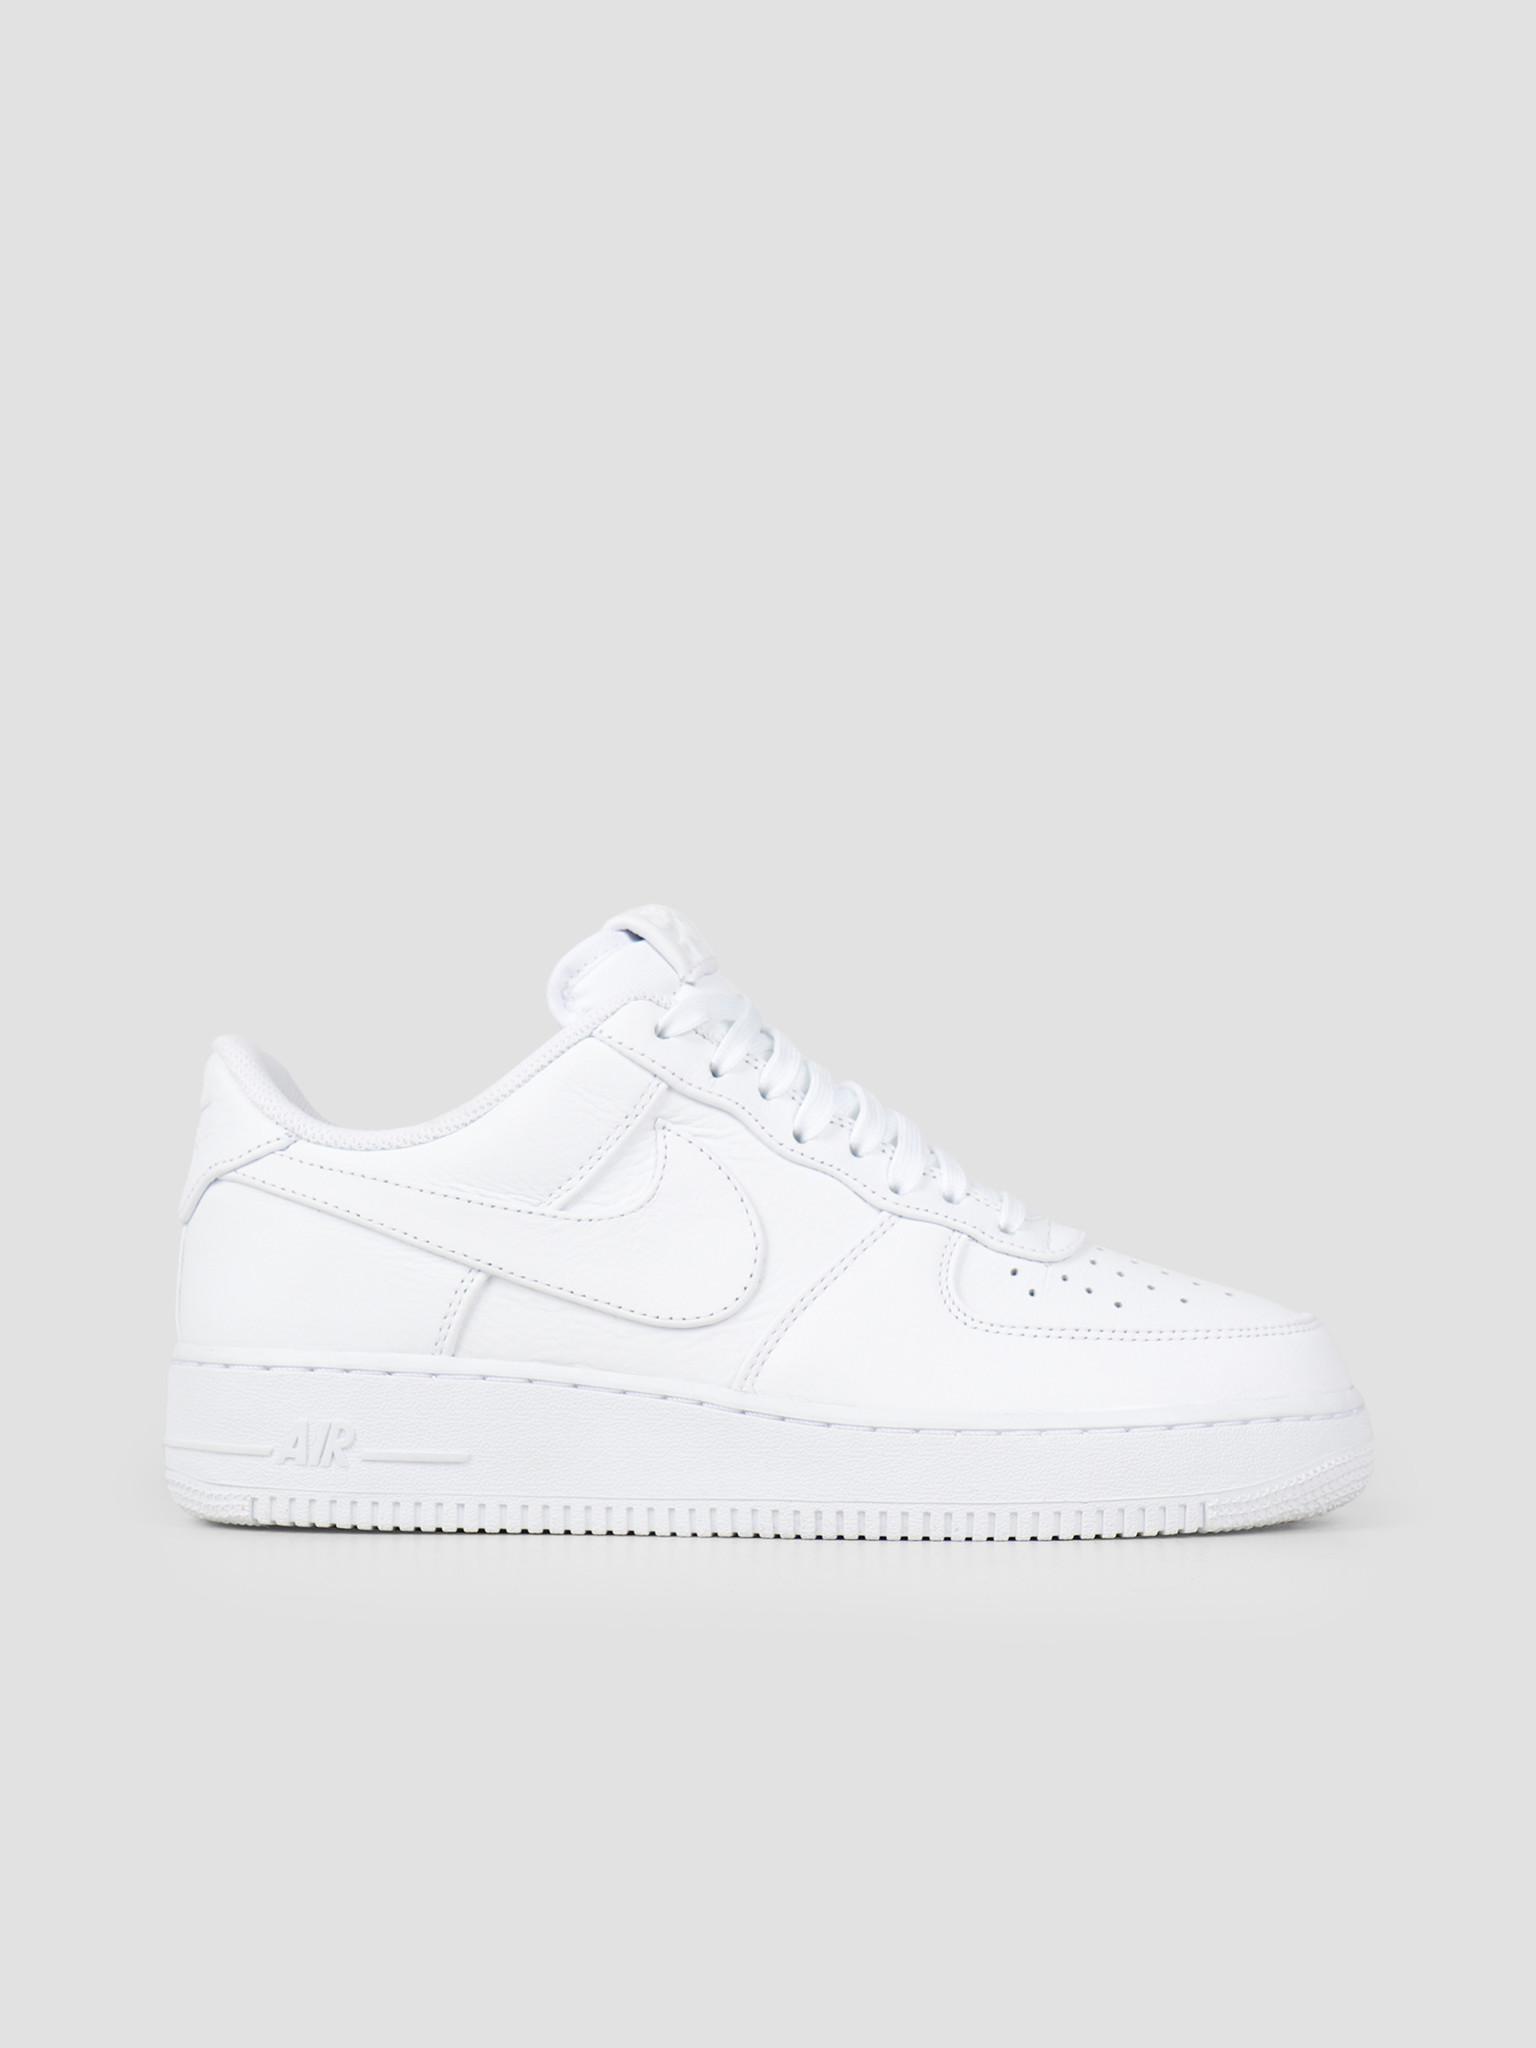 on sale d6a1f 86b09 Nike Nike Air Force 1 07 Premium 2 White AT4143-103